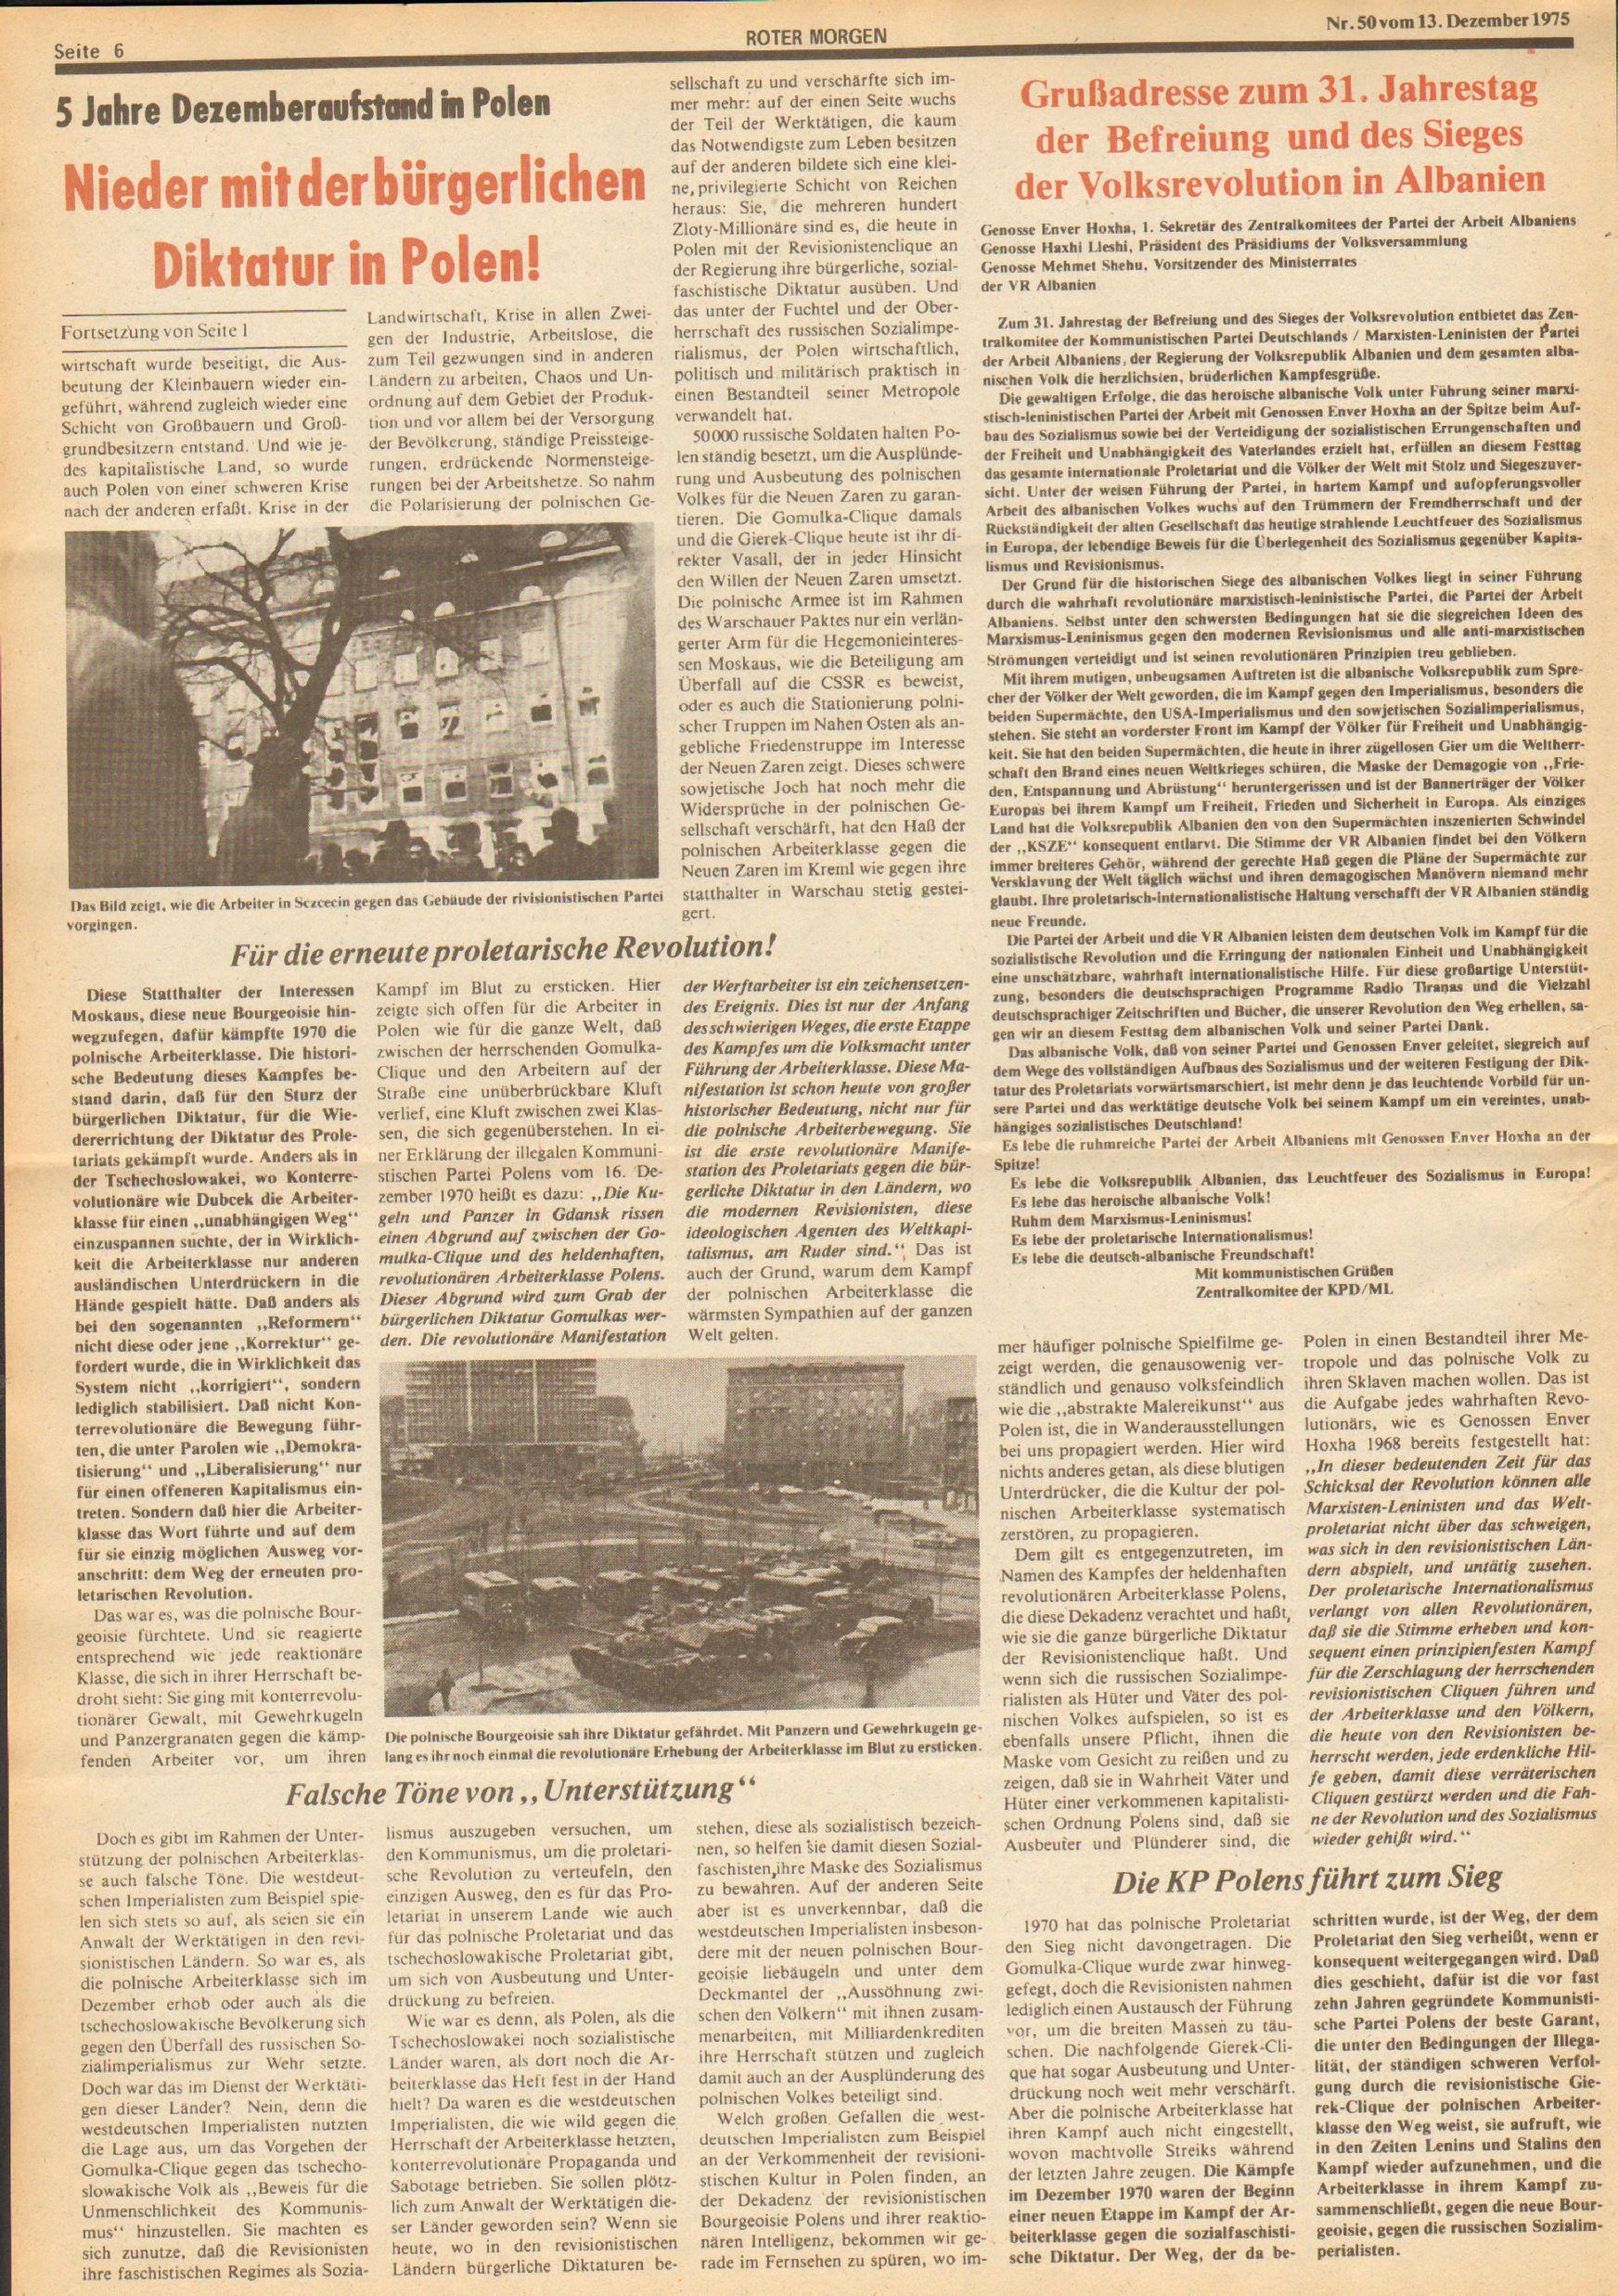 Roter Morgen, 9. Jg., 13. Dezember 1975, Nr. 50, Seite 6